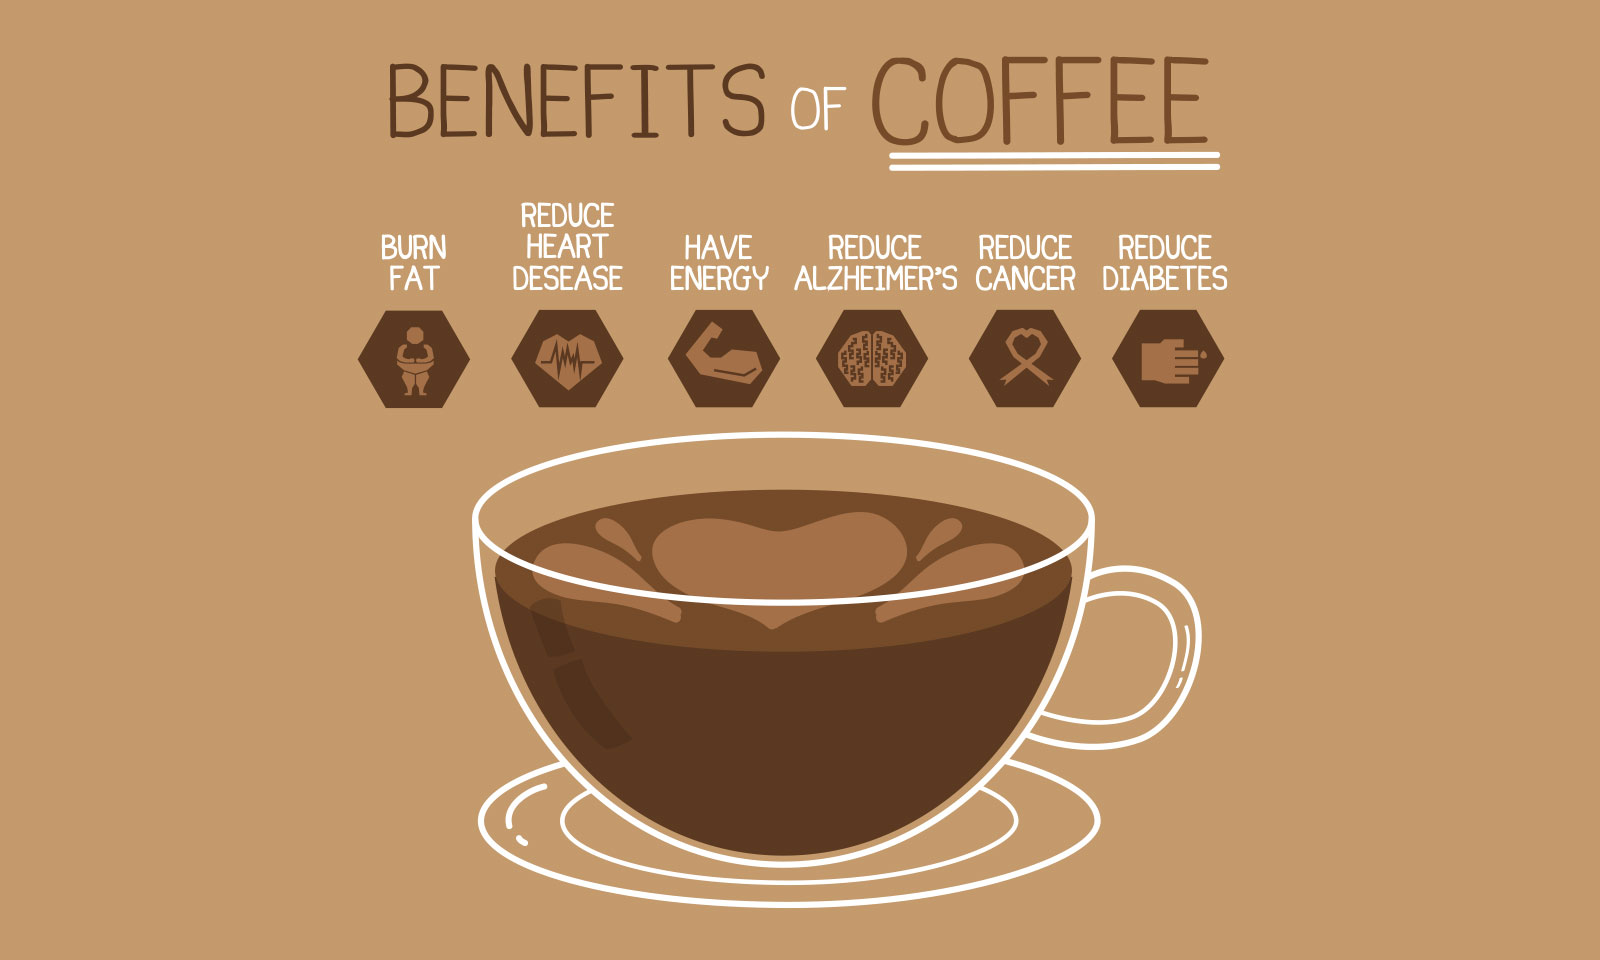 http://santosjayaabadi.co.id/factoryoutlet/contents/images/lg/posts/POST_Benerfits_Of_Coffee_(20181029035203).jpg